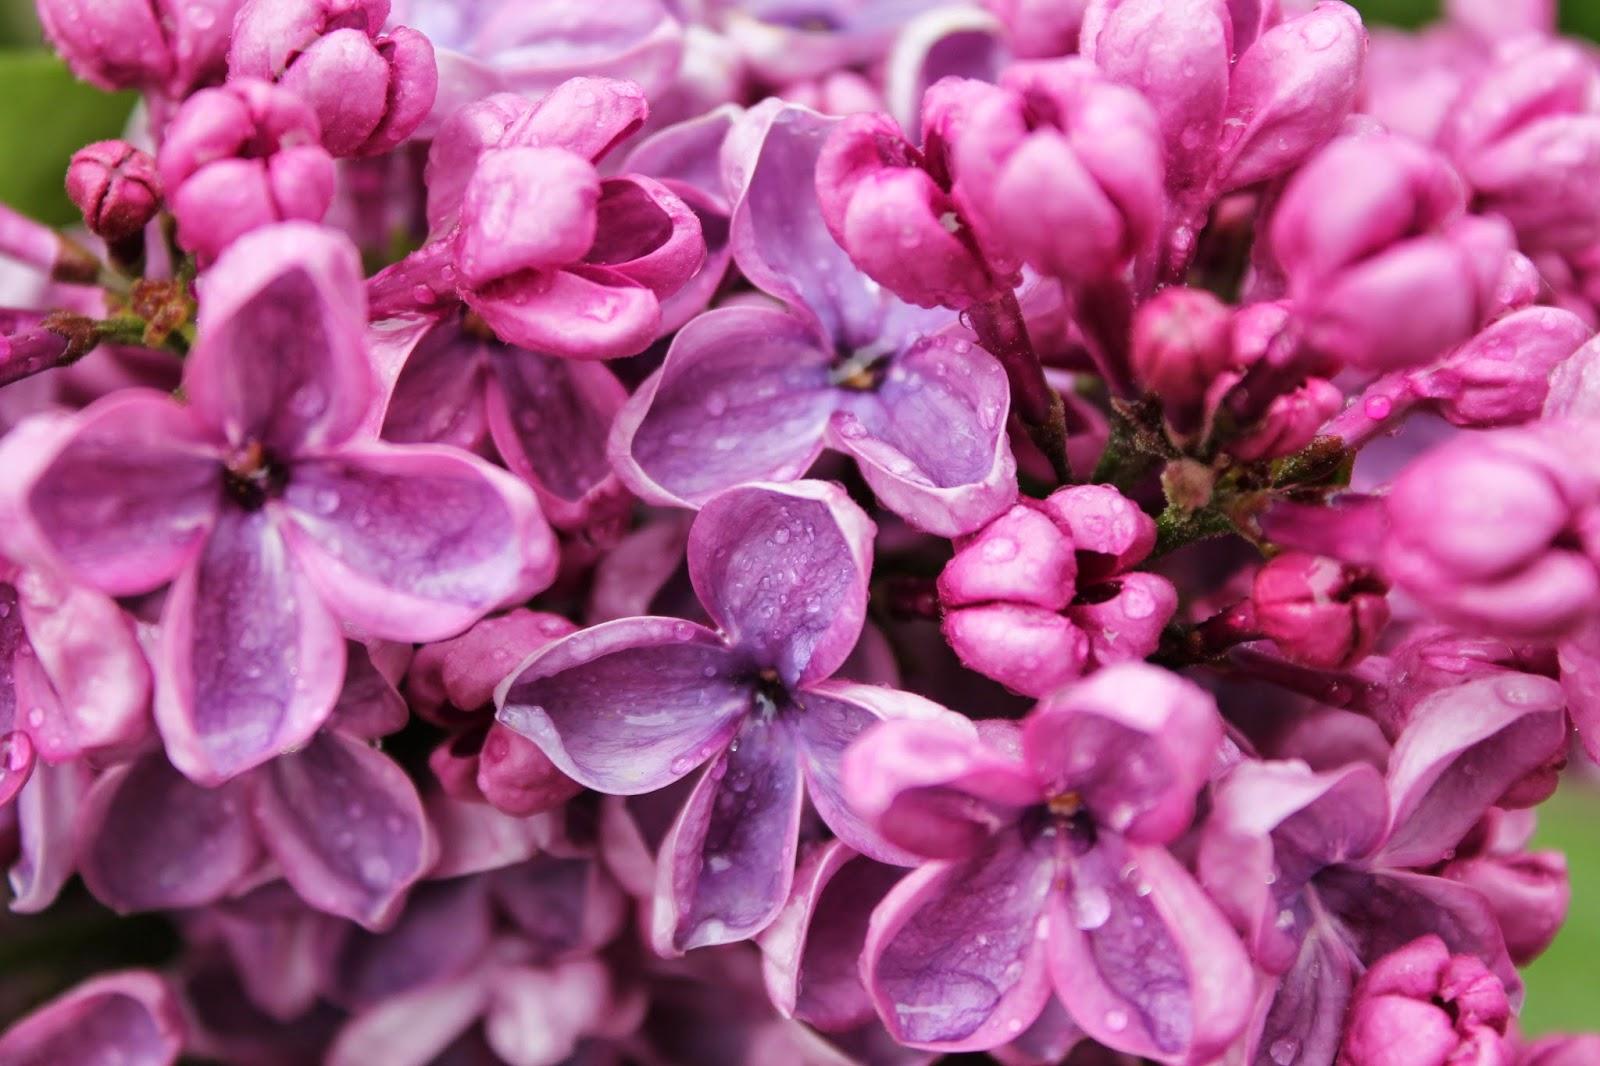 http://www.patriciabowe.com/Perfume-Oils/LilacOil.html